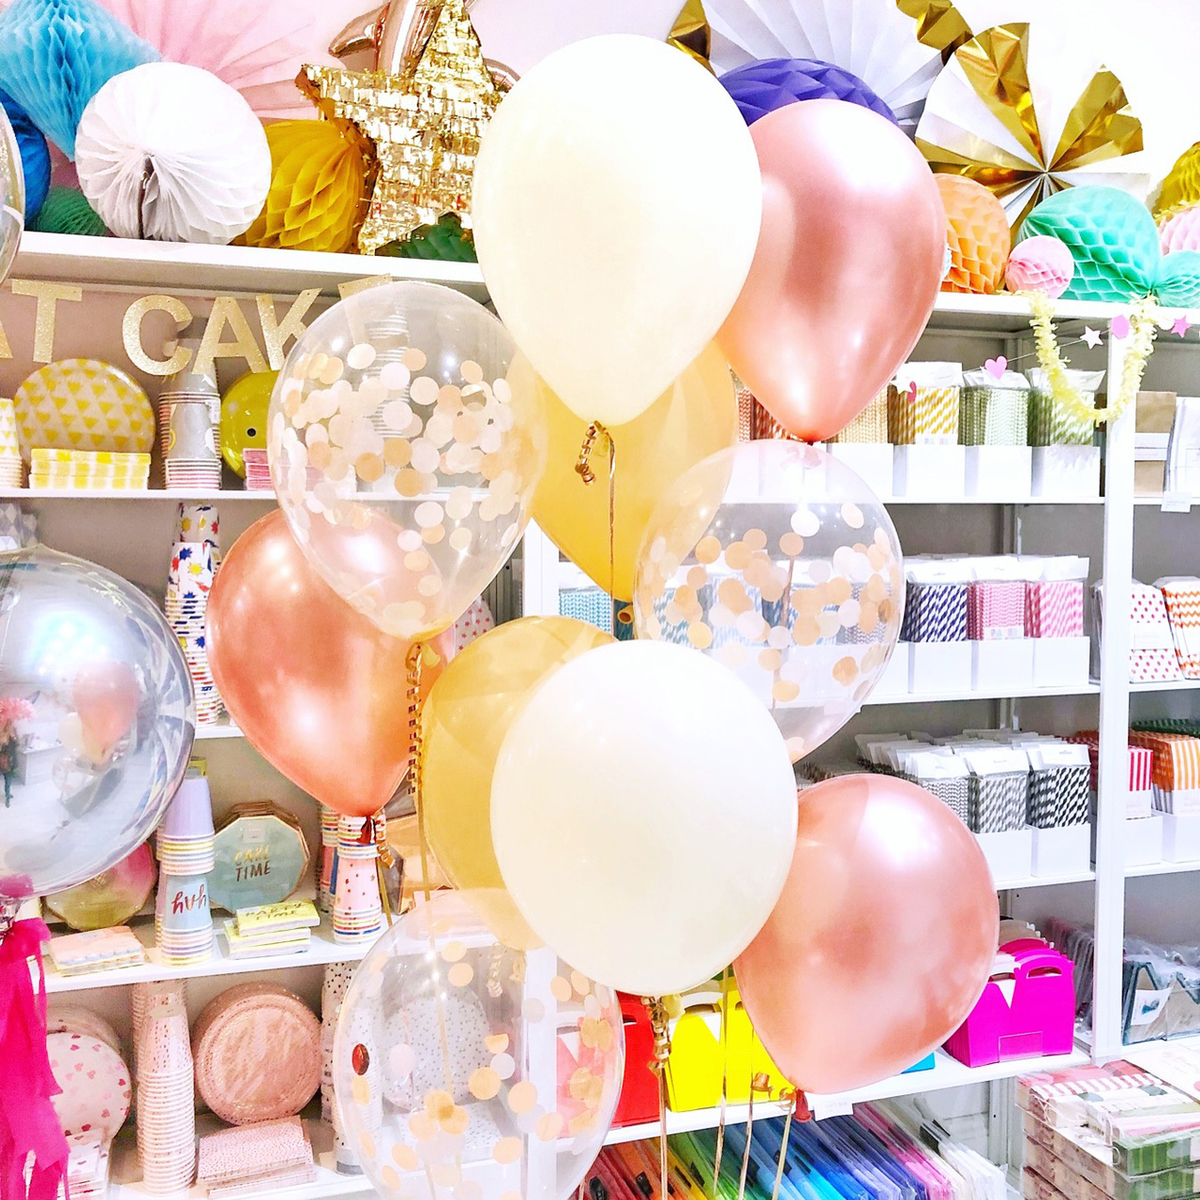 rose-diamond-party-balloon-collection-54609.1543412996.1200.1200.jpg